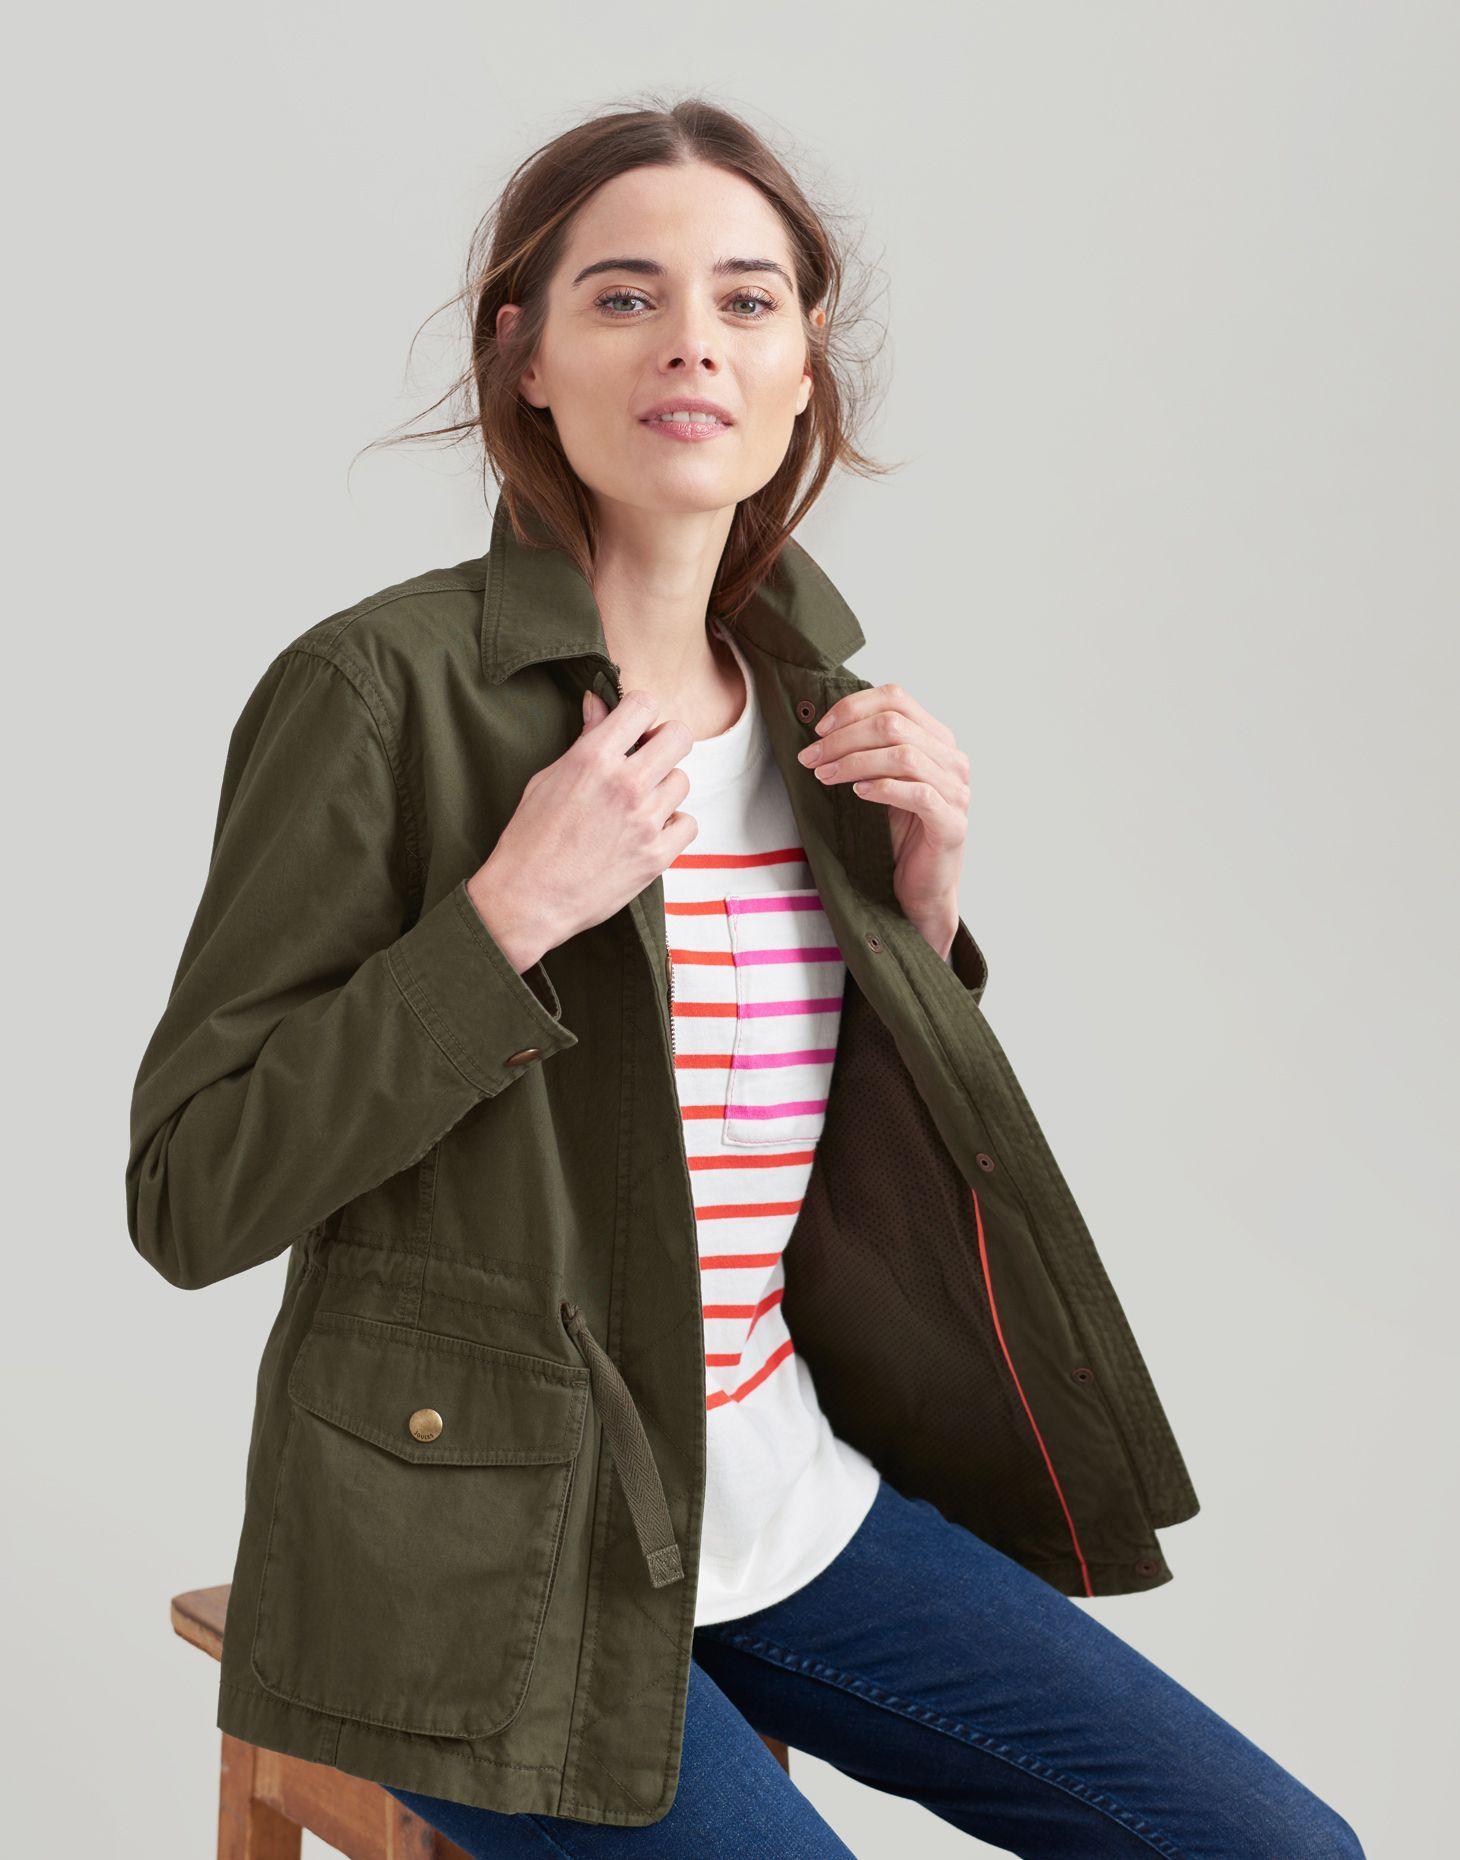 Corinne Dark Green Lightweight Casual Jacket Joules Us Safari Jacket Fashion Casual Jacket [ 1860 x 1460 Pixel ]